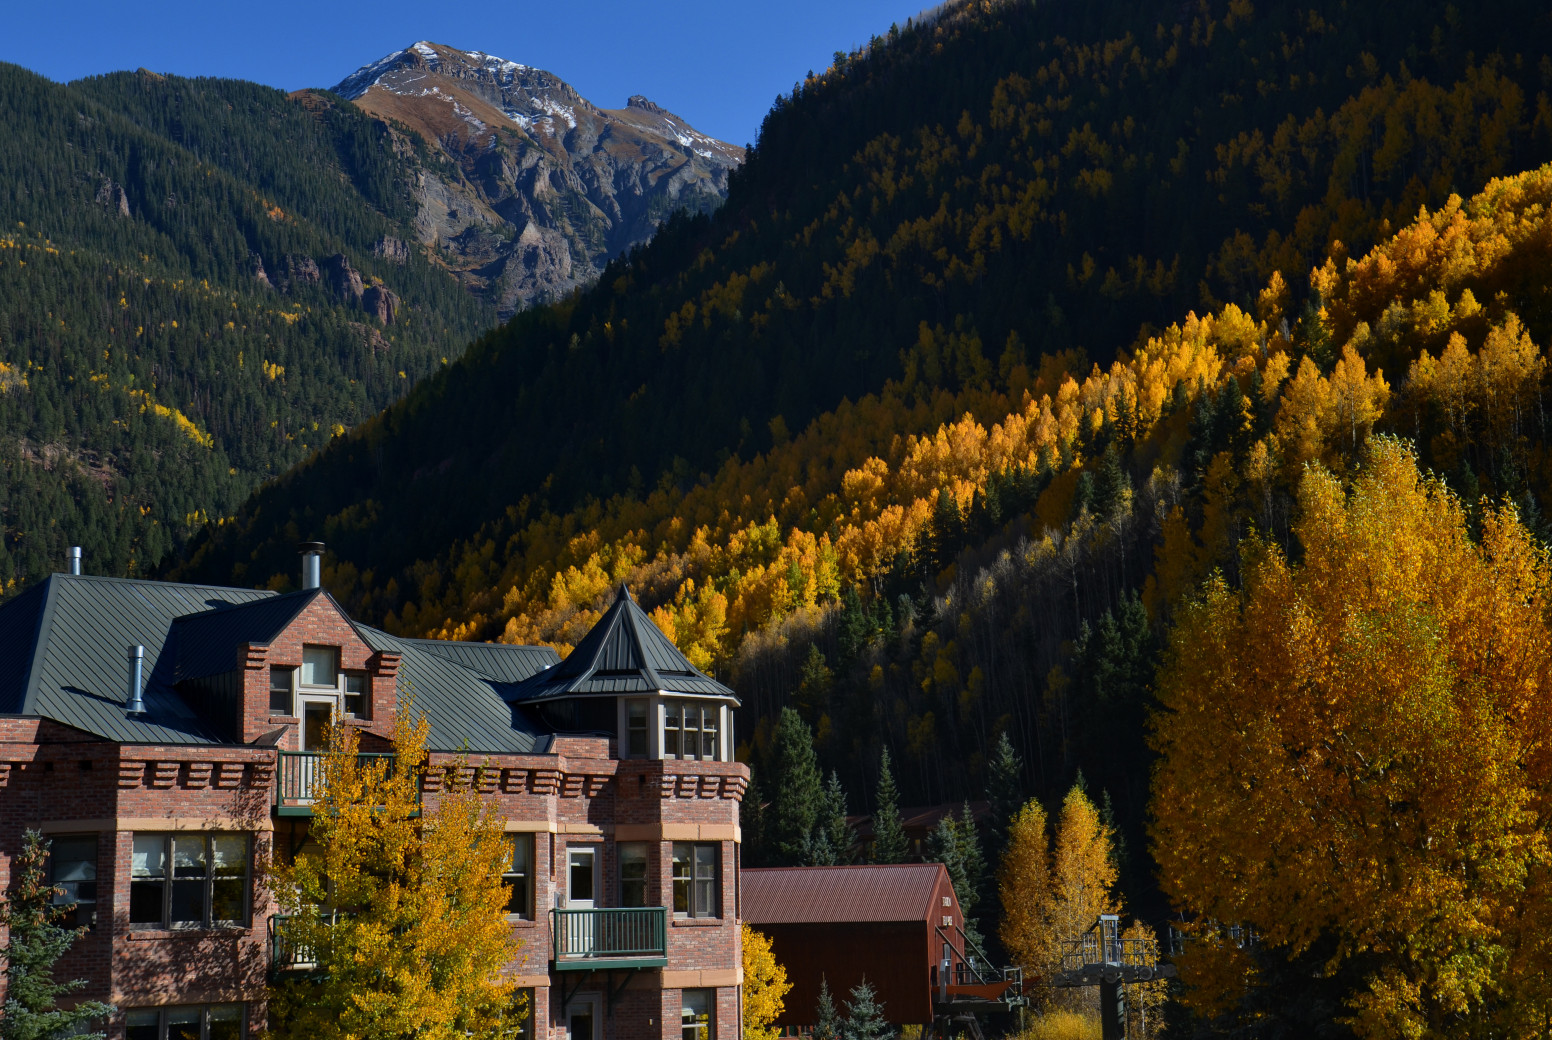 hotelc-exterior-fall-mtn-view.jpg